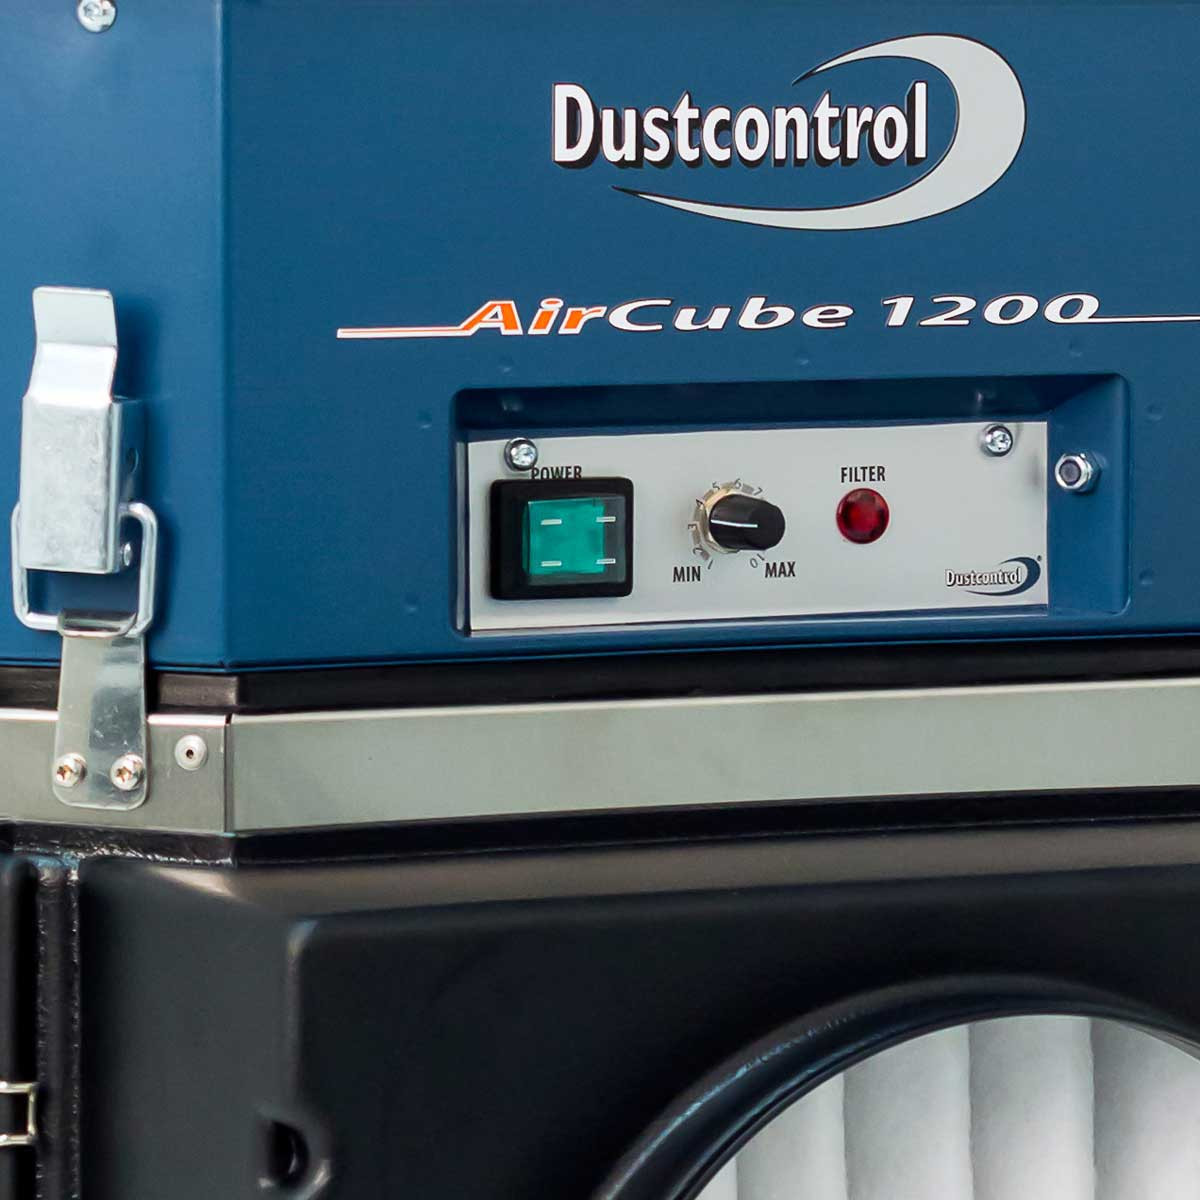 DustControl DC AirCube 1200, 115V